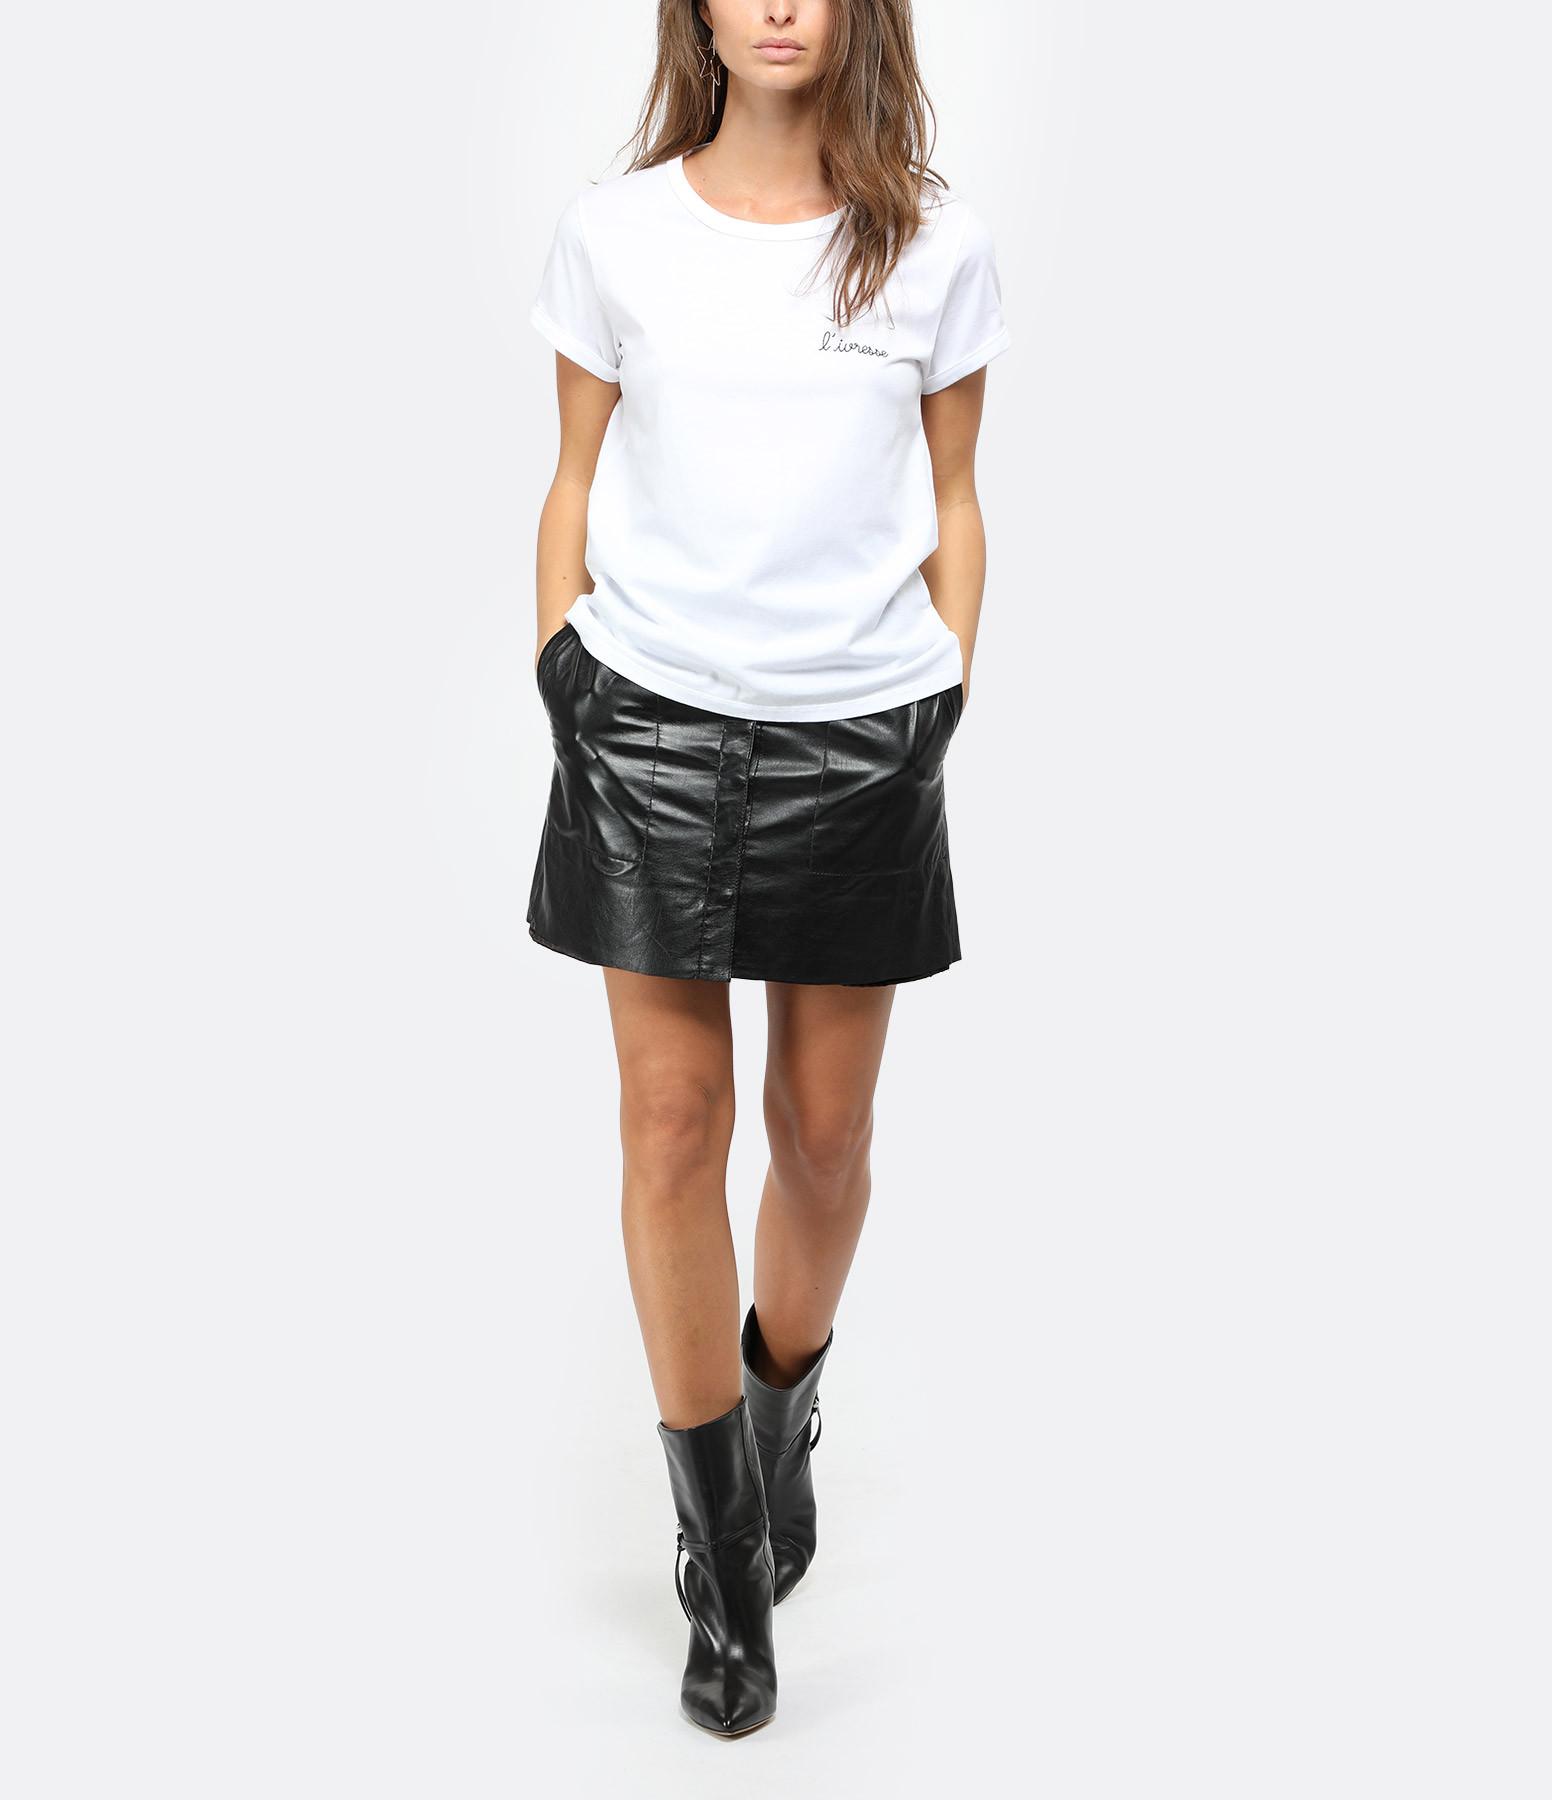 MAISON LABICHE - Tee-shirt  Livresse Blanc